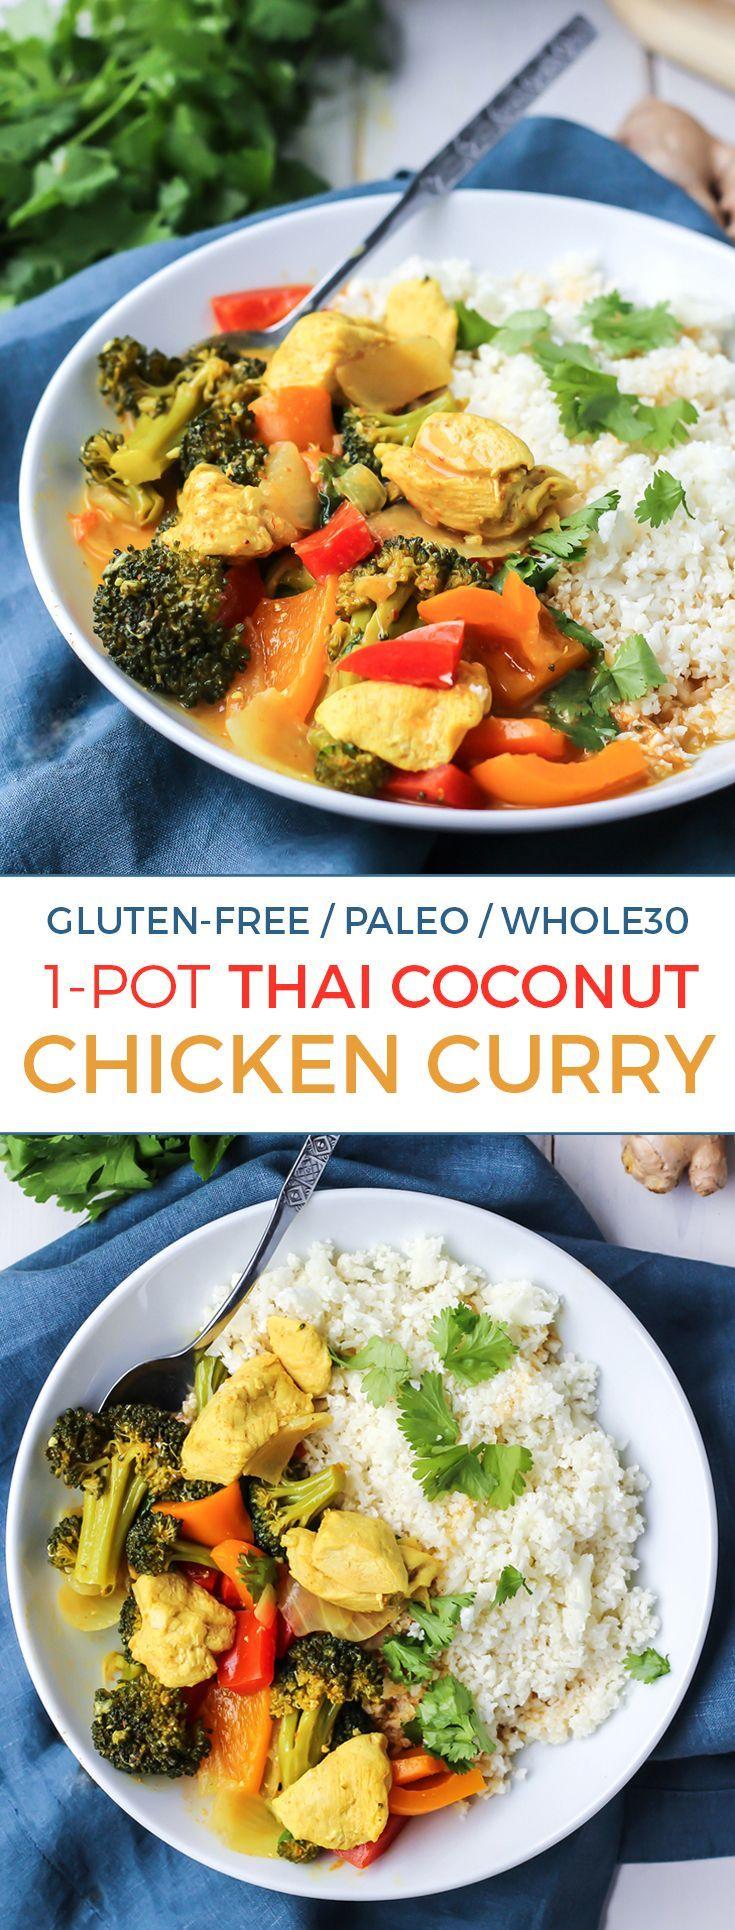 1-Pot Thai Coconut Chicken Curry [ Paleo, Whole30 ]